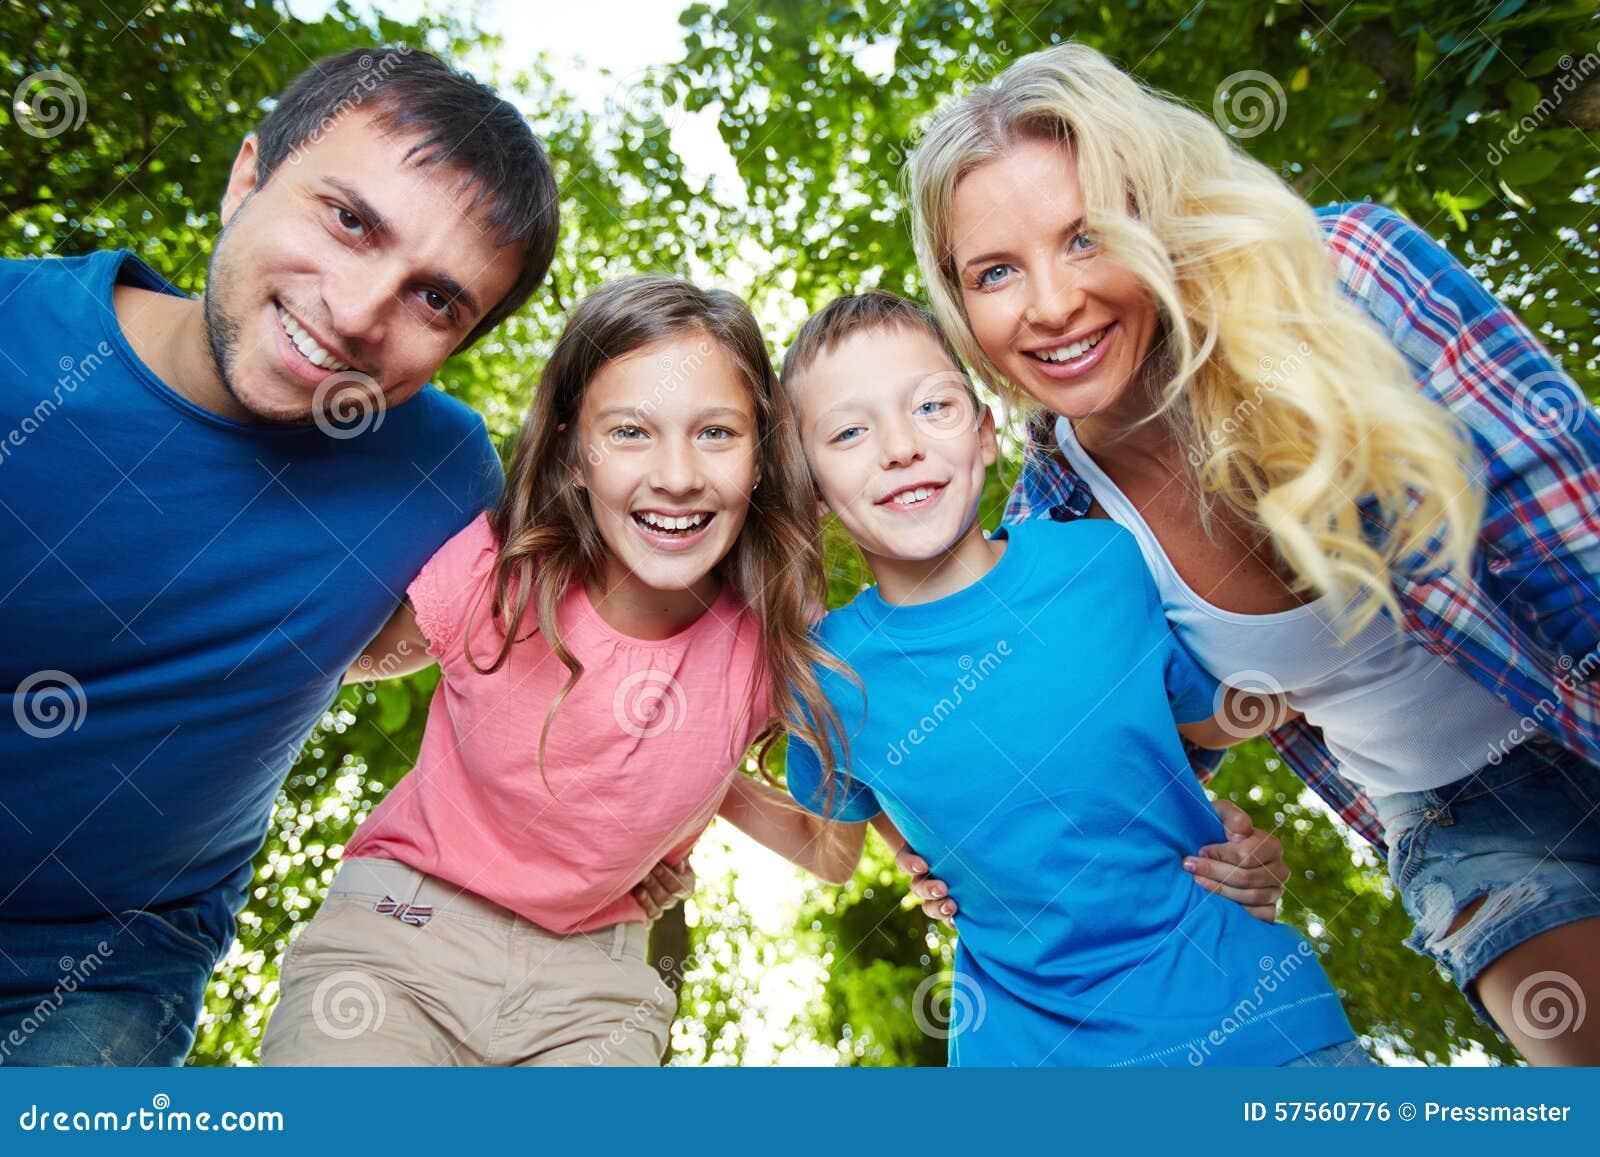 Family union